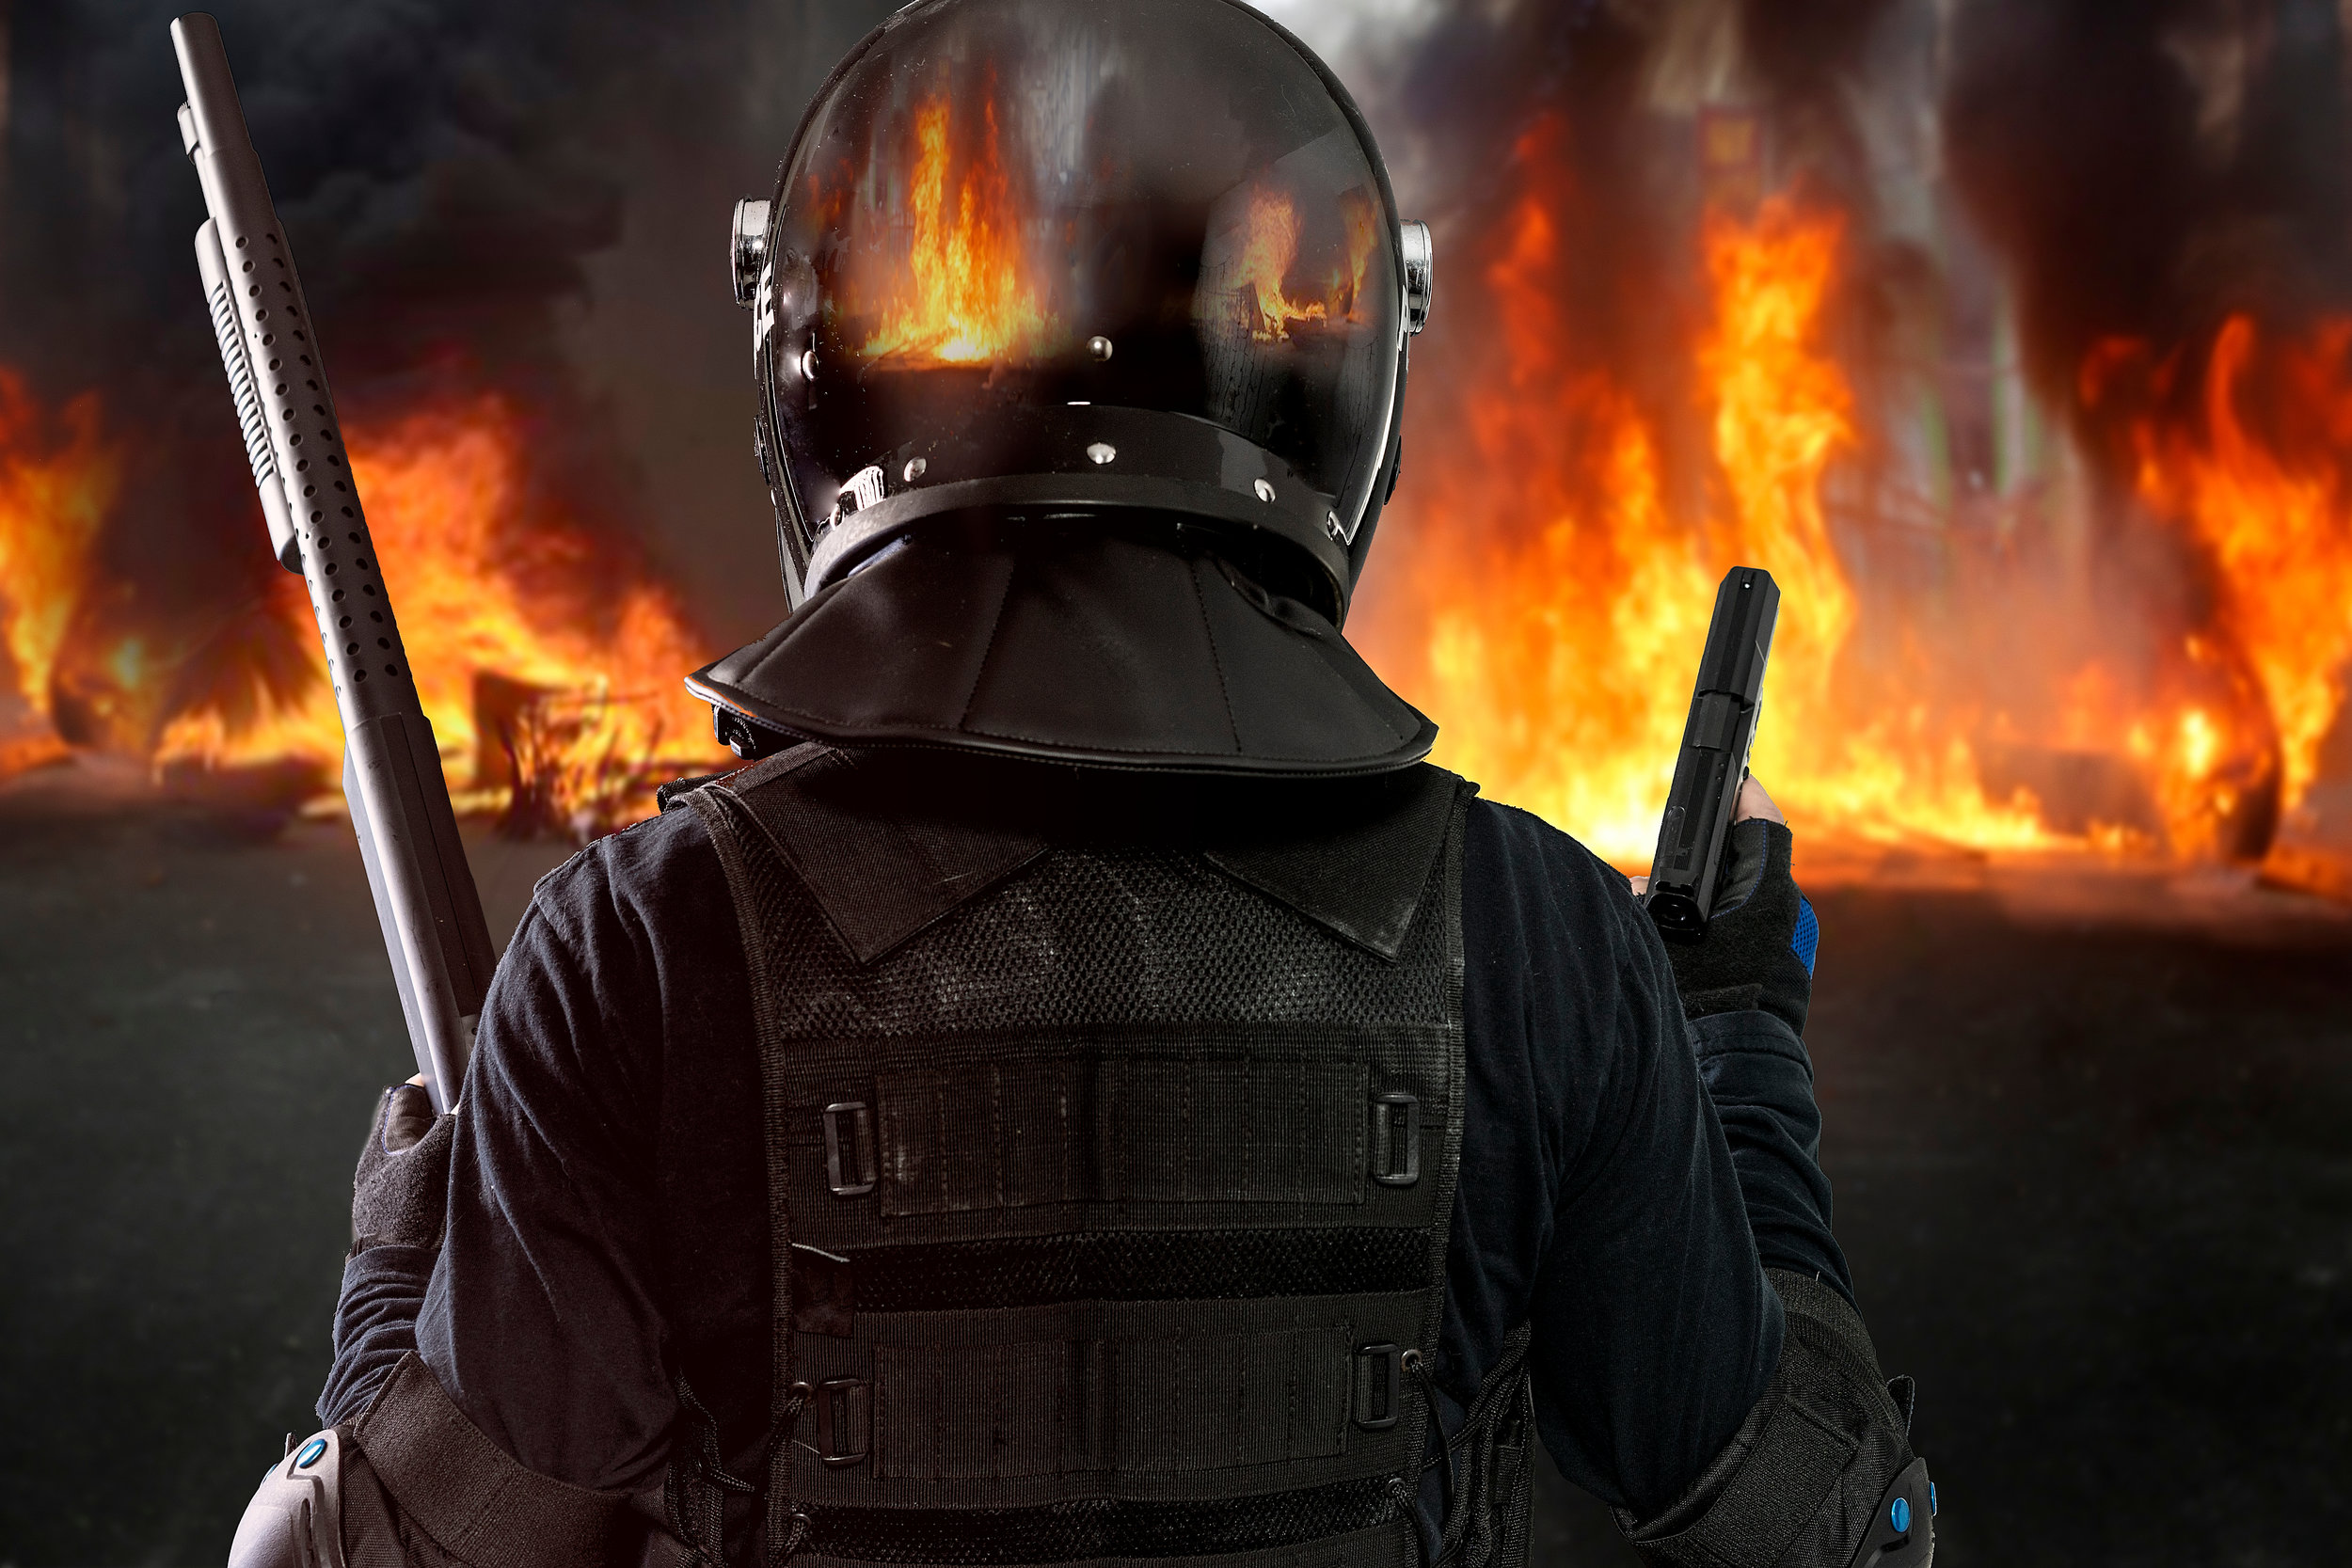 bigstock-Burning-barricades-policeman--239370325.jpg